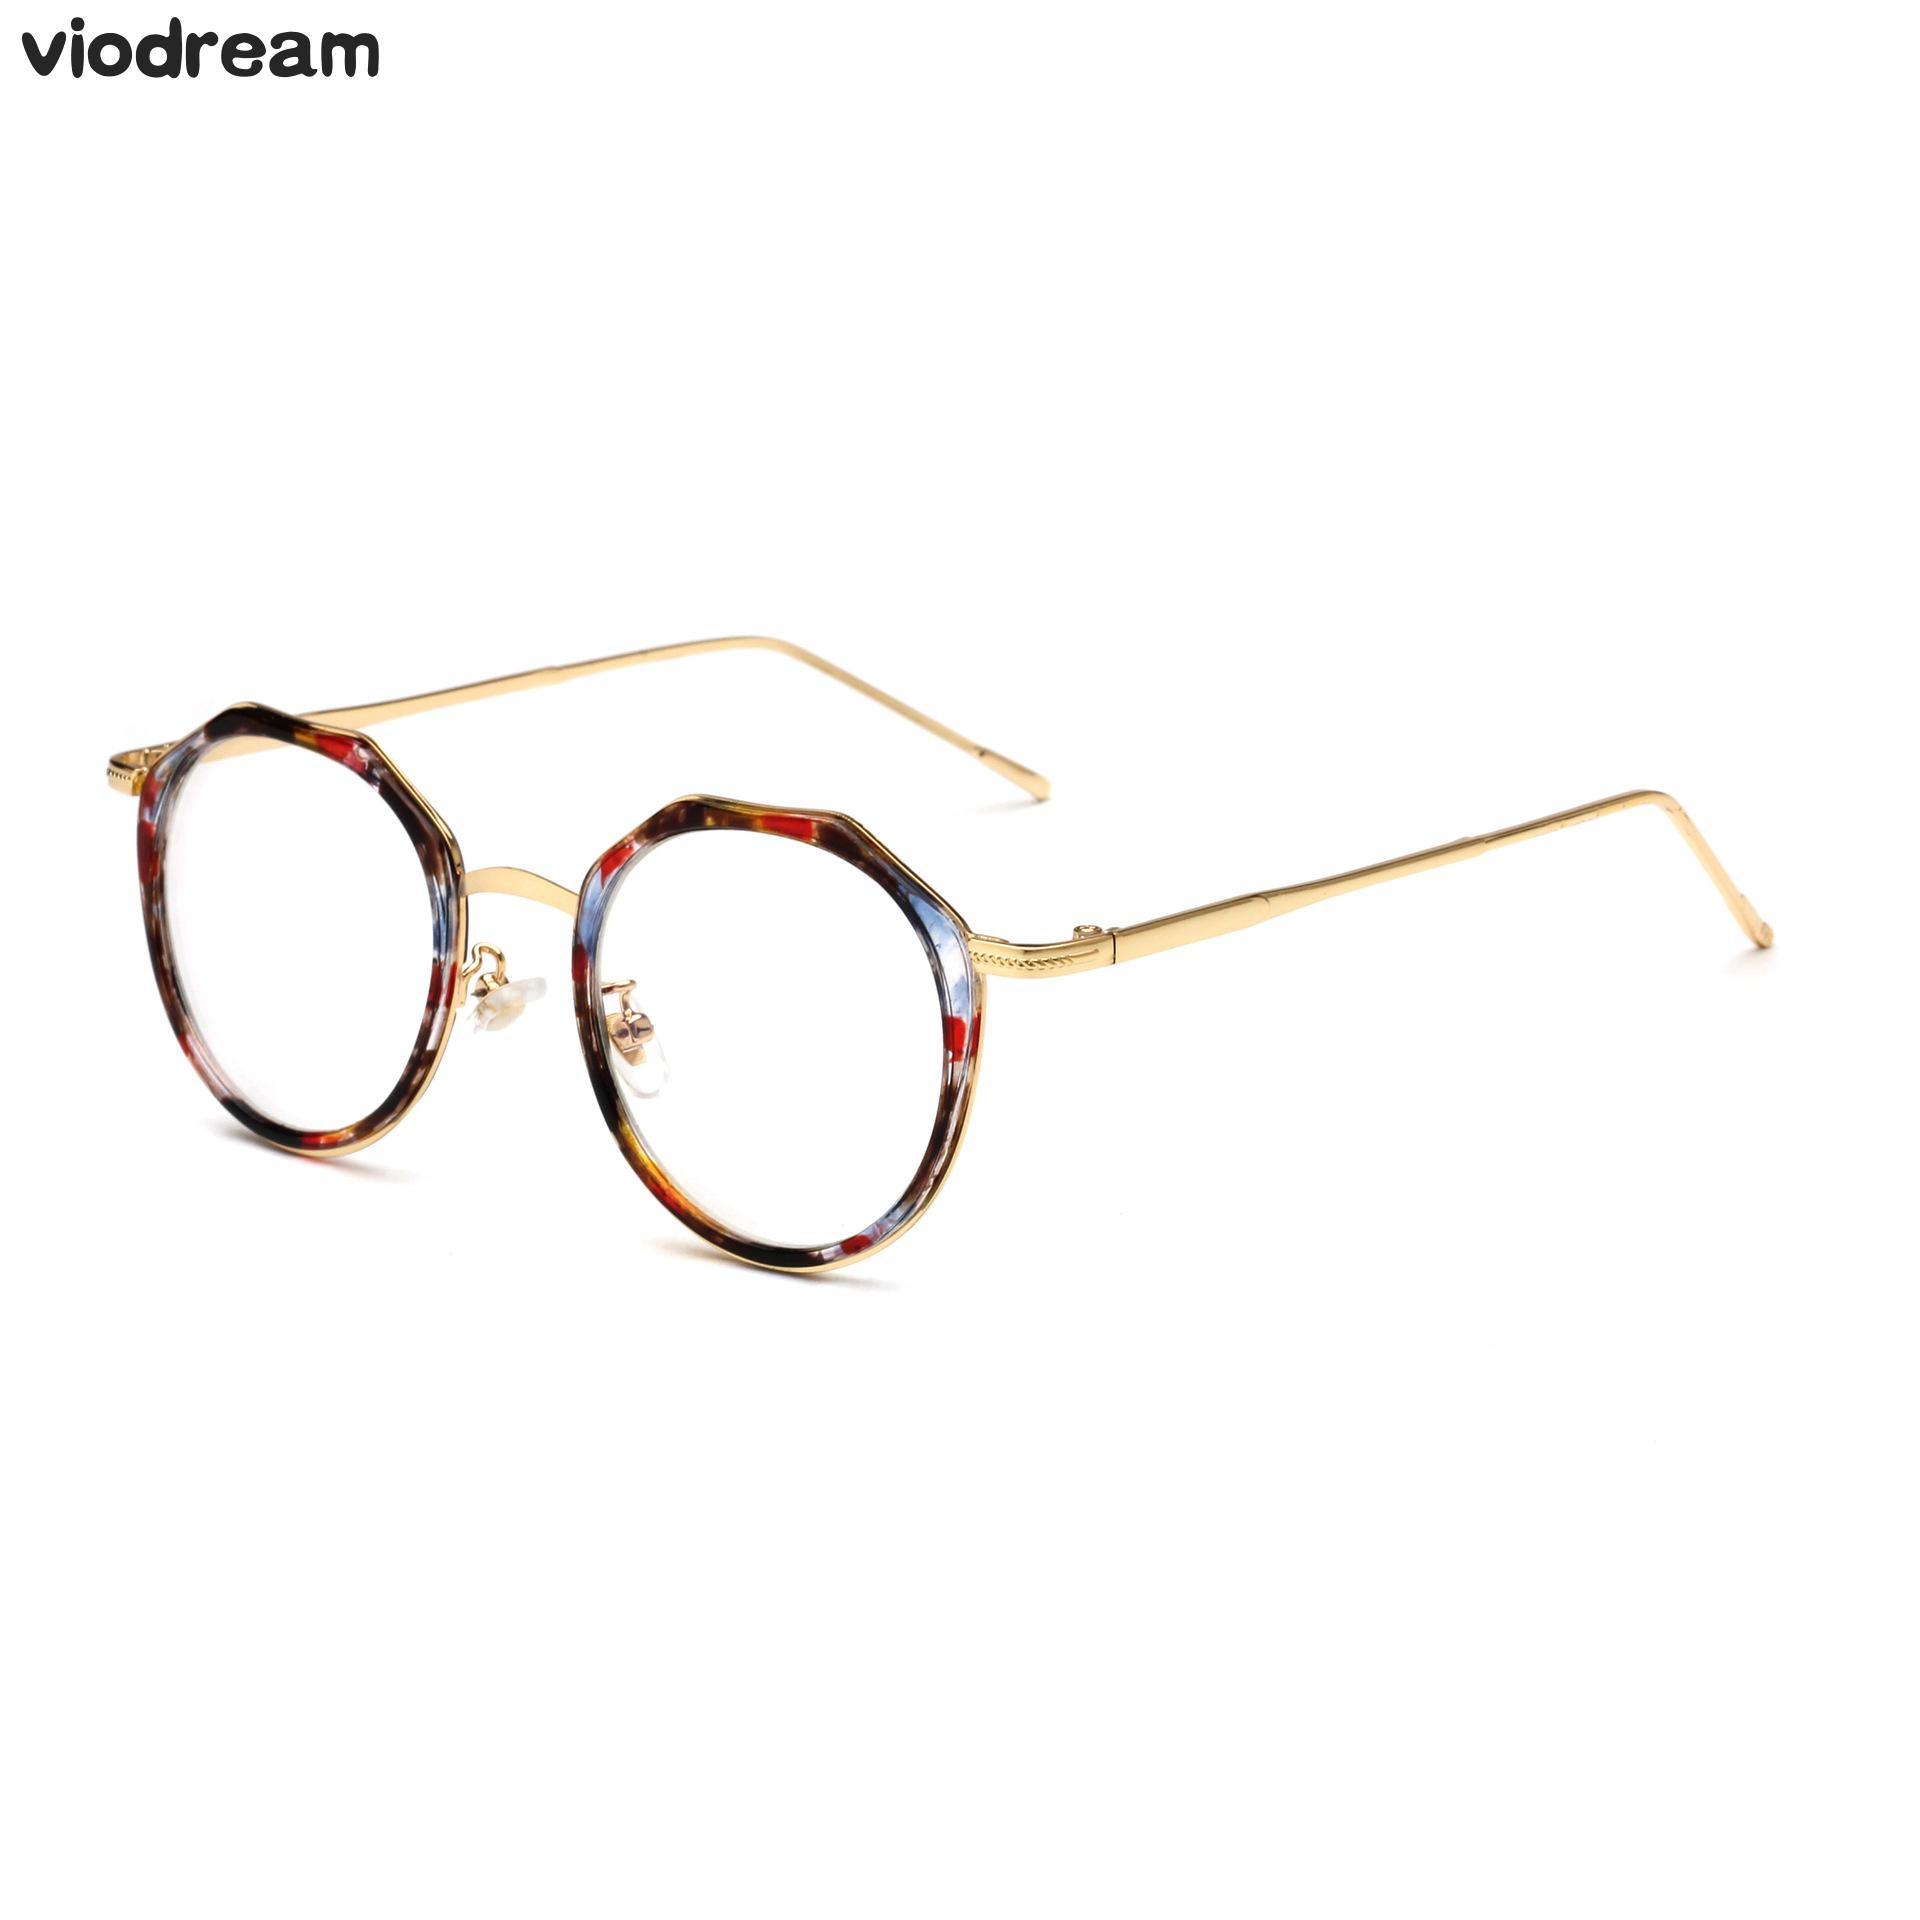 Viodream Retro Round Metal Anti Blue Ray Glasses Frame Prescription ...